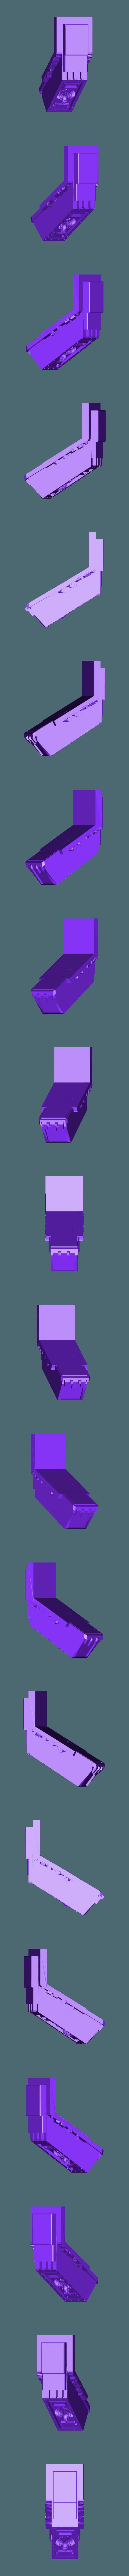 head.stl Download free STL file Super Breaking and Entering Boxy Robot • 3D printer model, bentanweihao